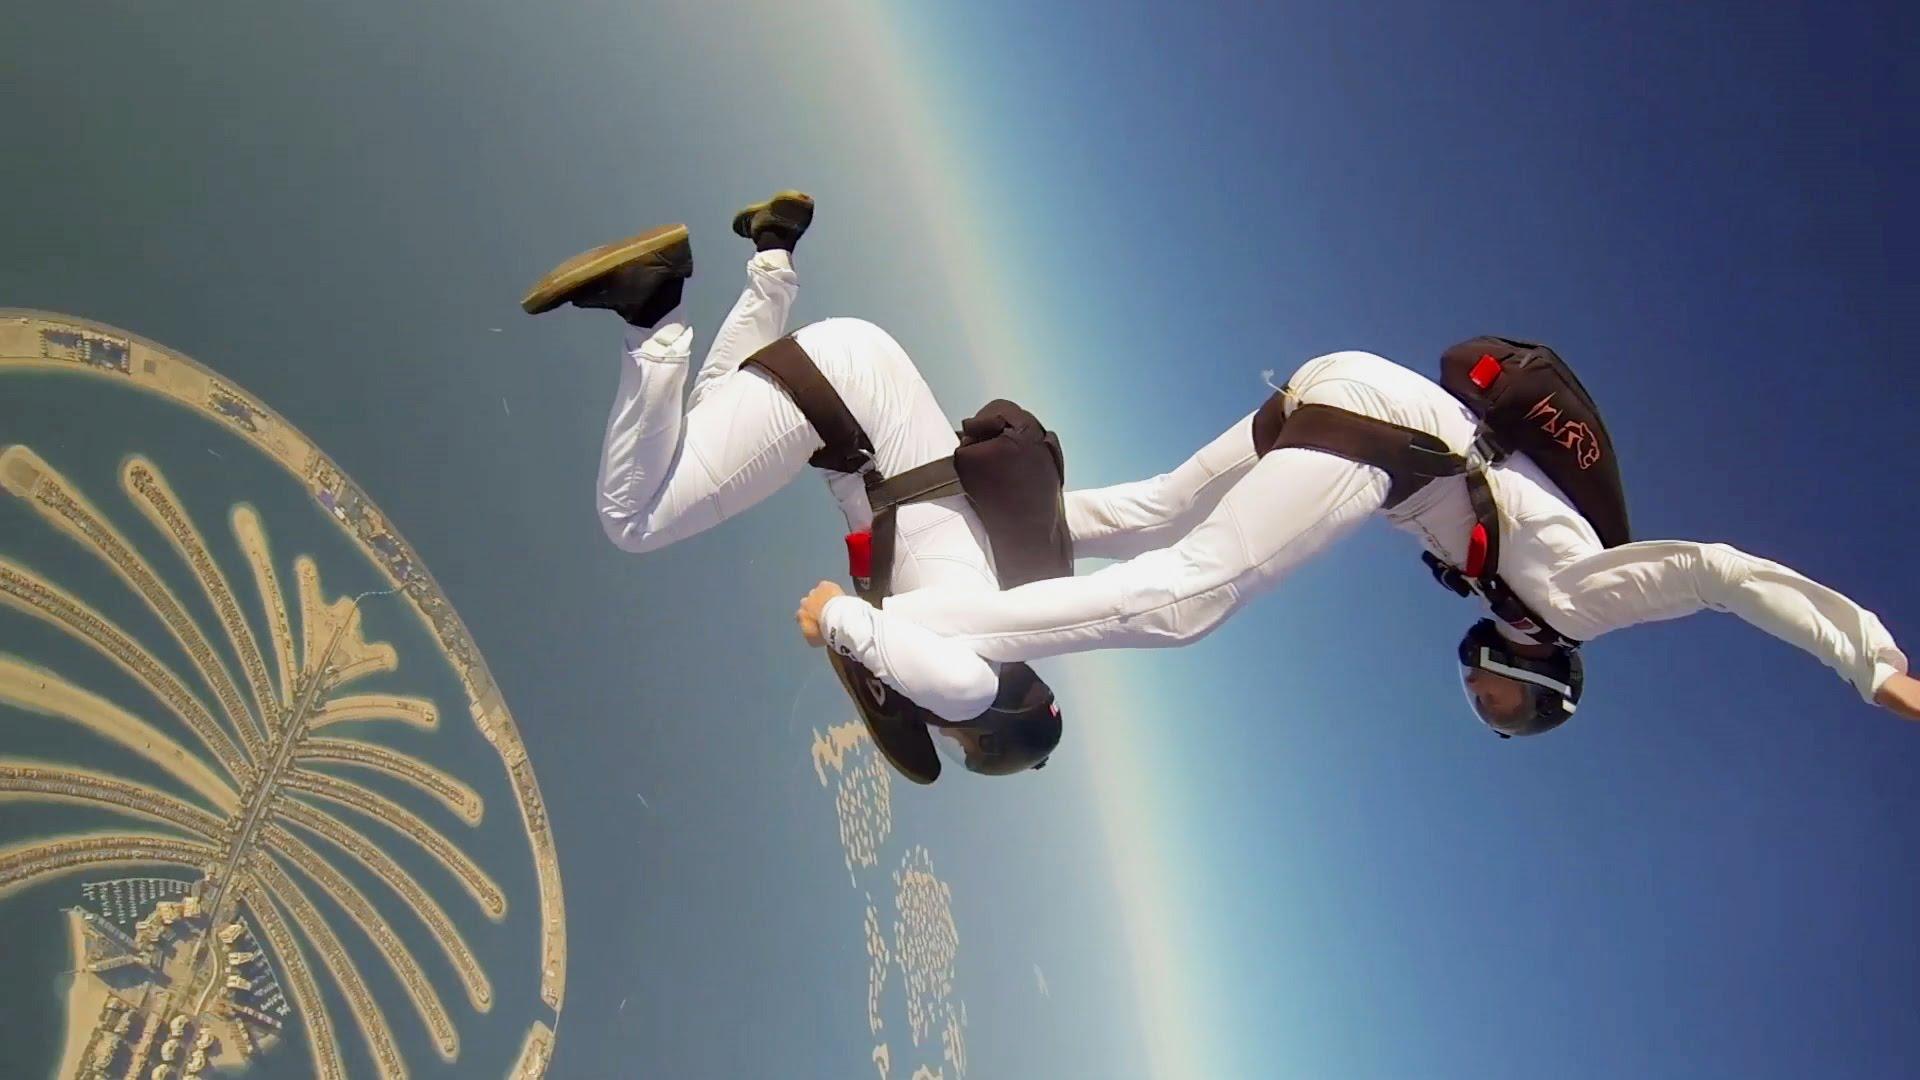 Gesynchroniseerde skydive boven Dubai